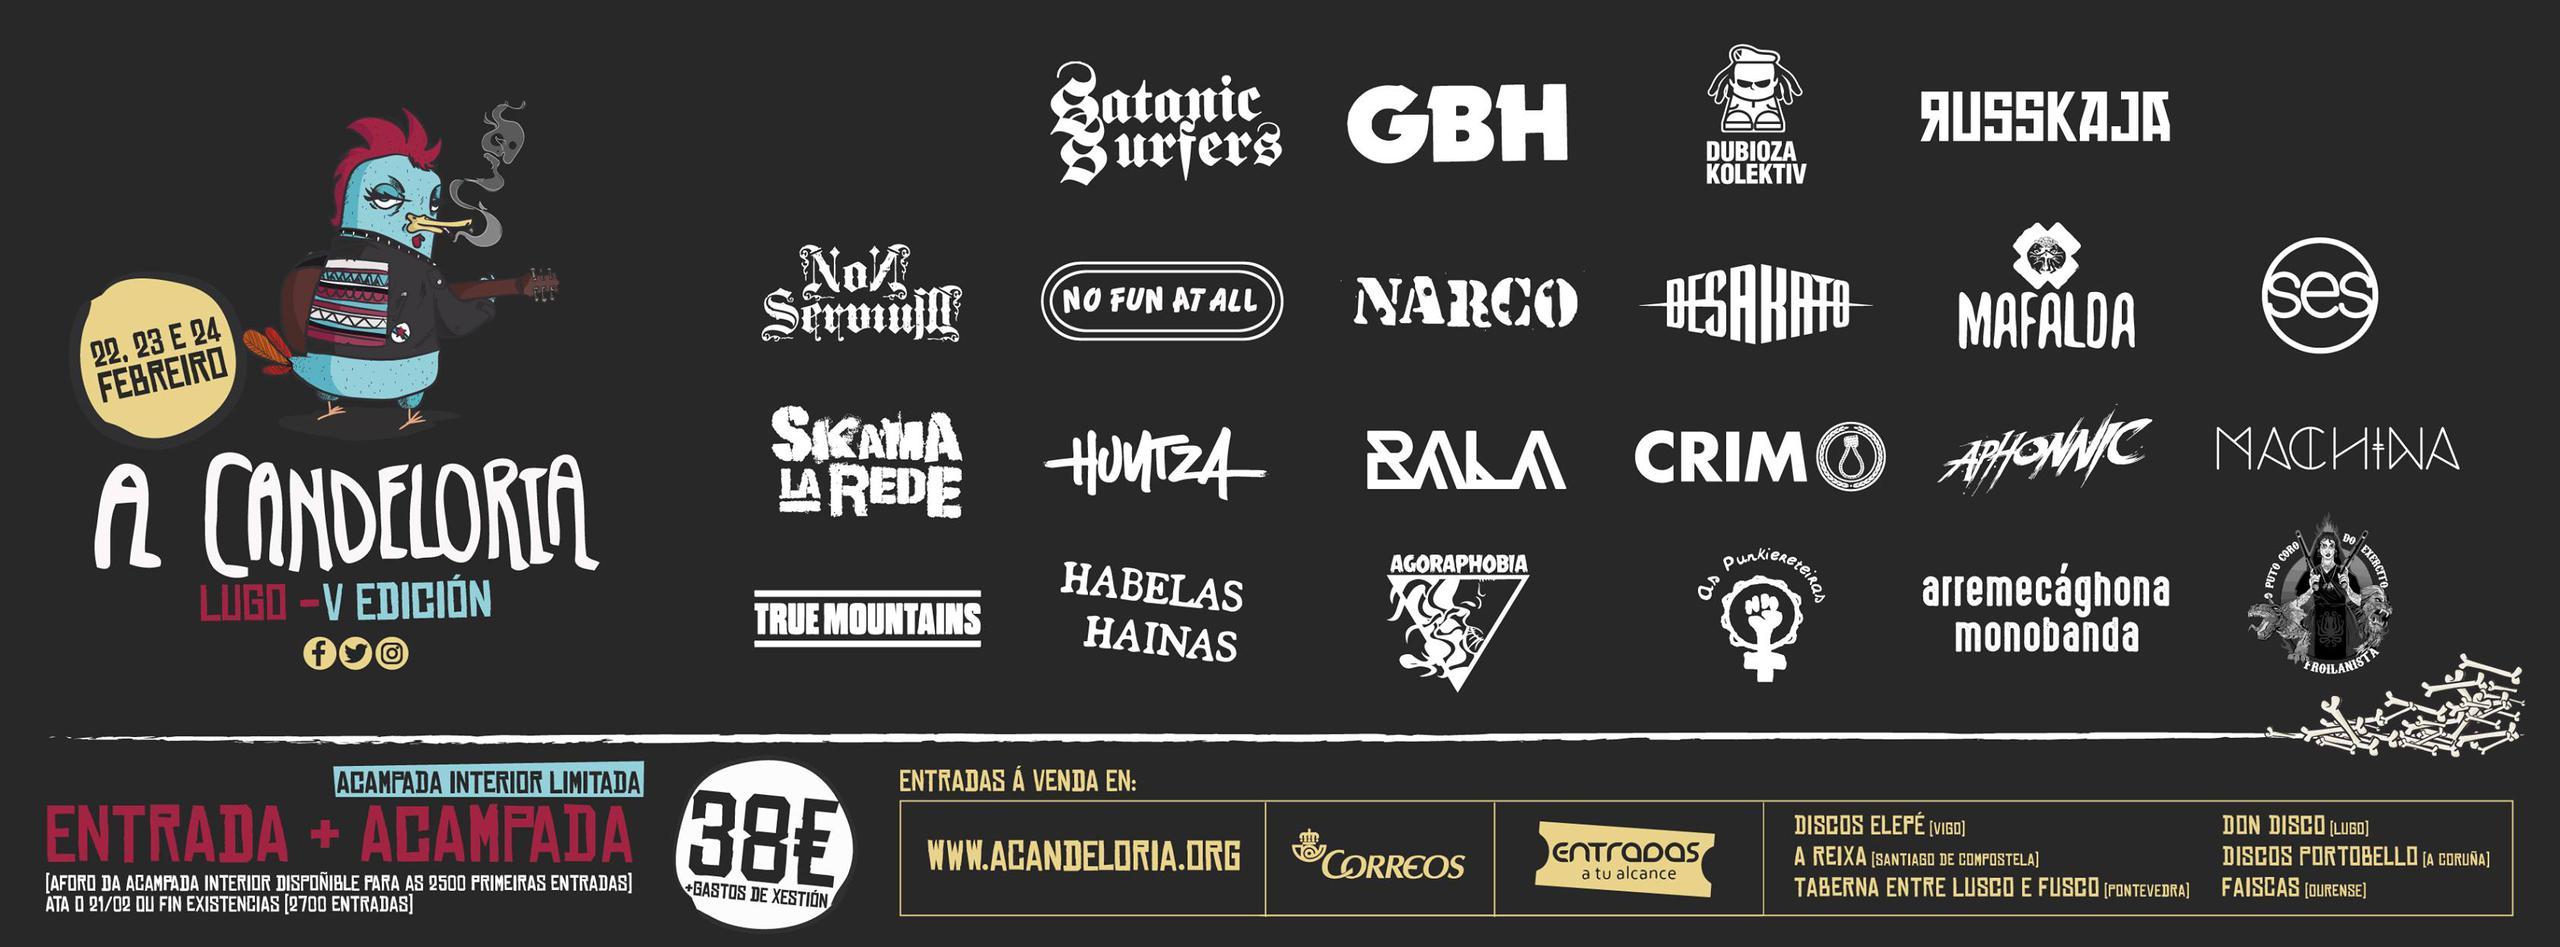 Cartel completo festival A Candeloria 2018 Lugo